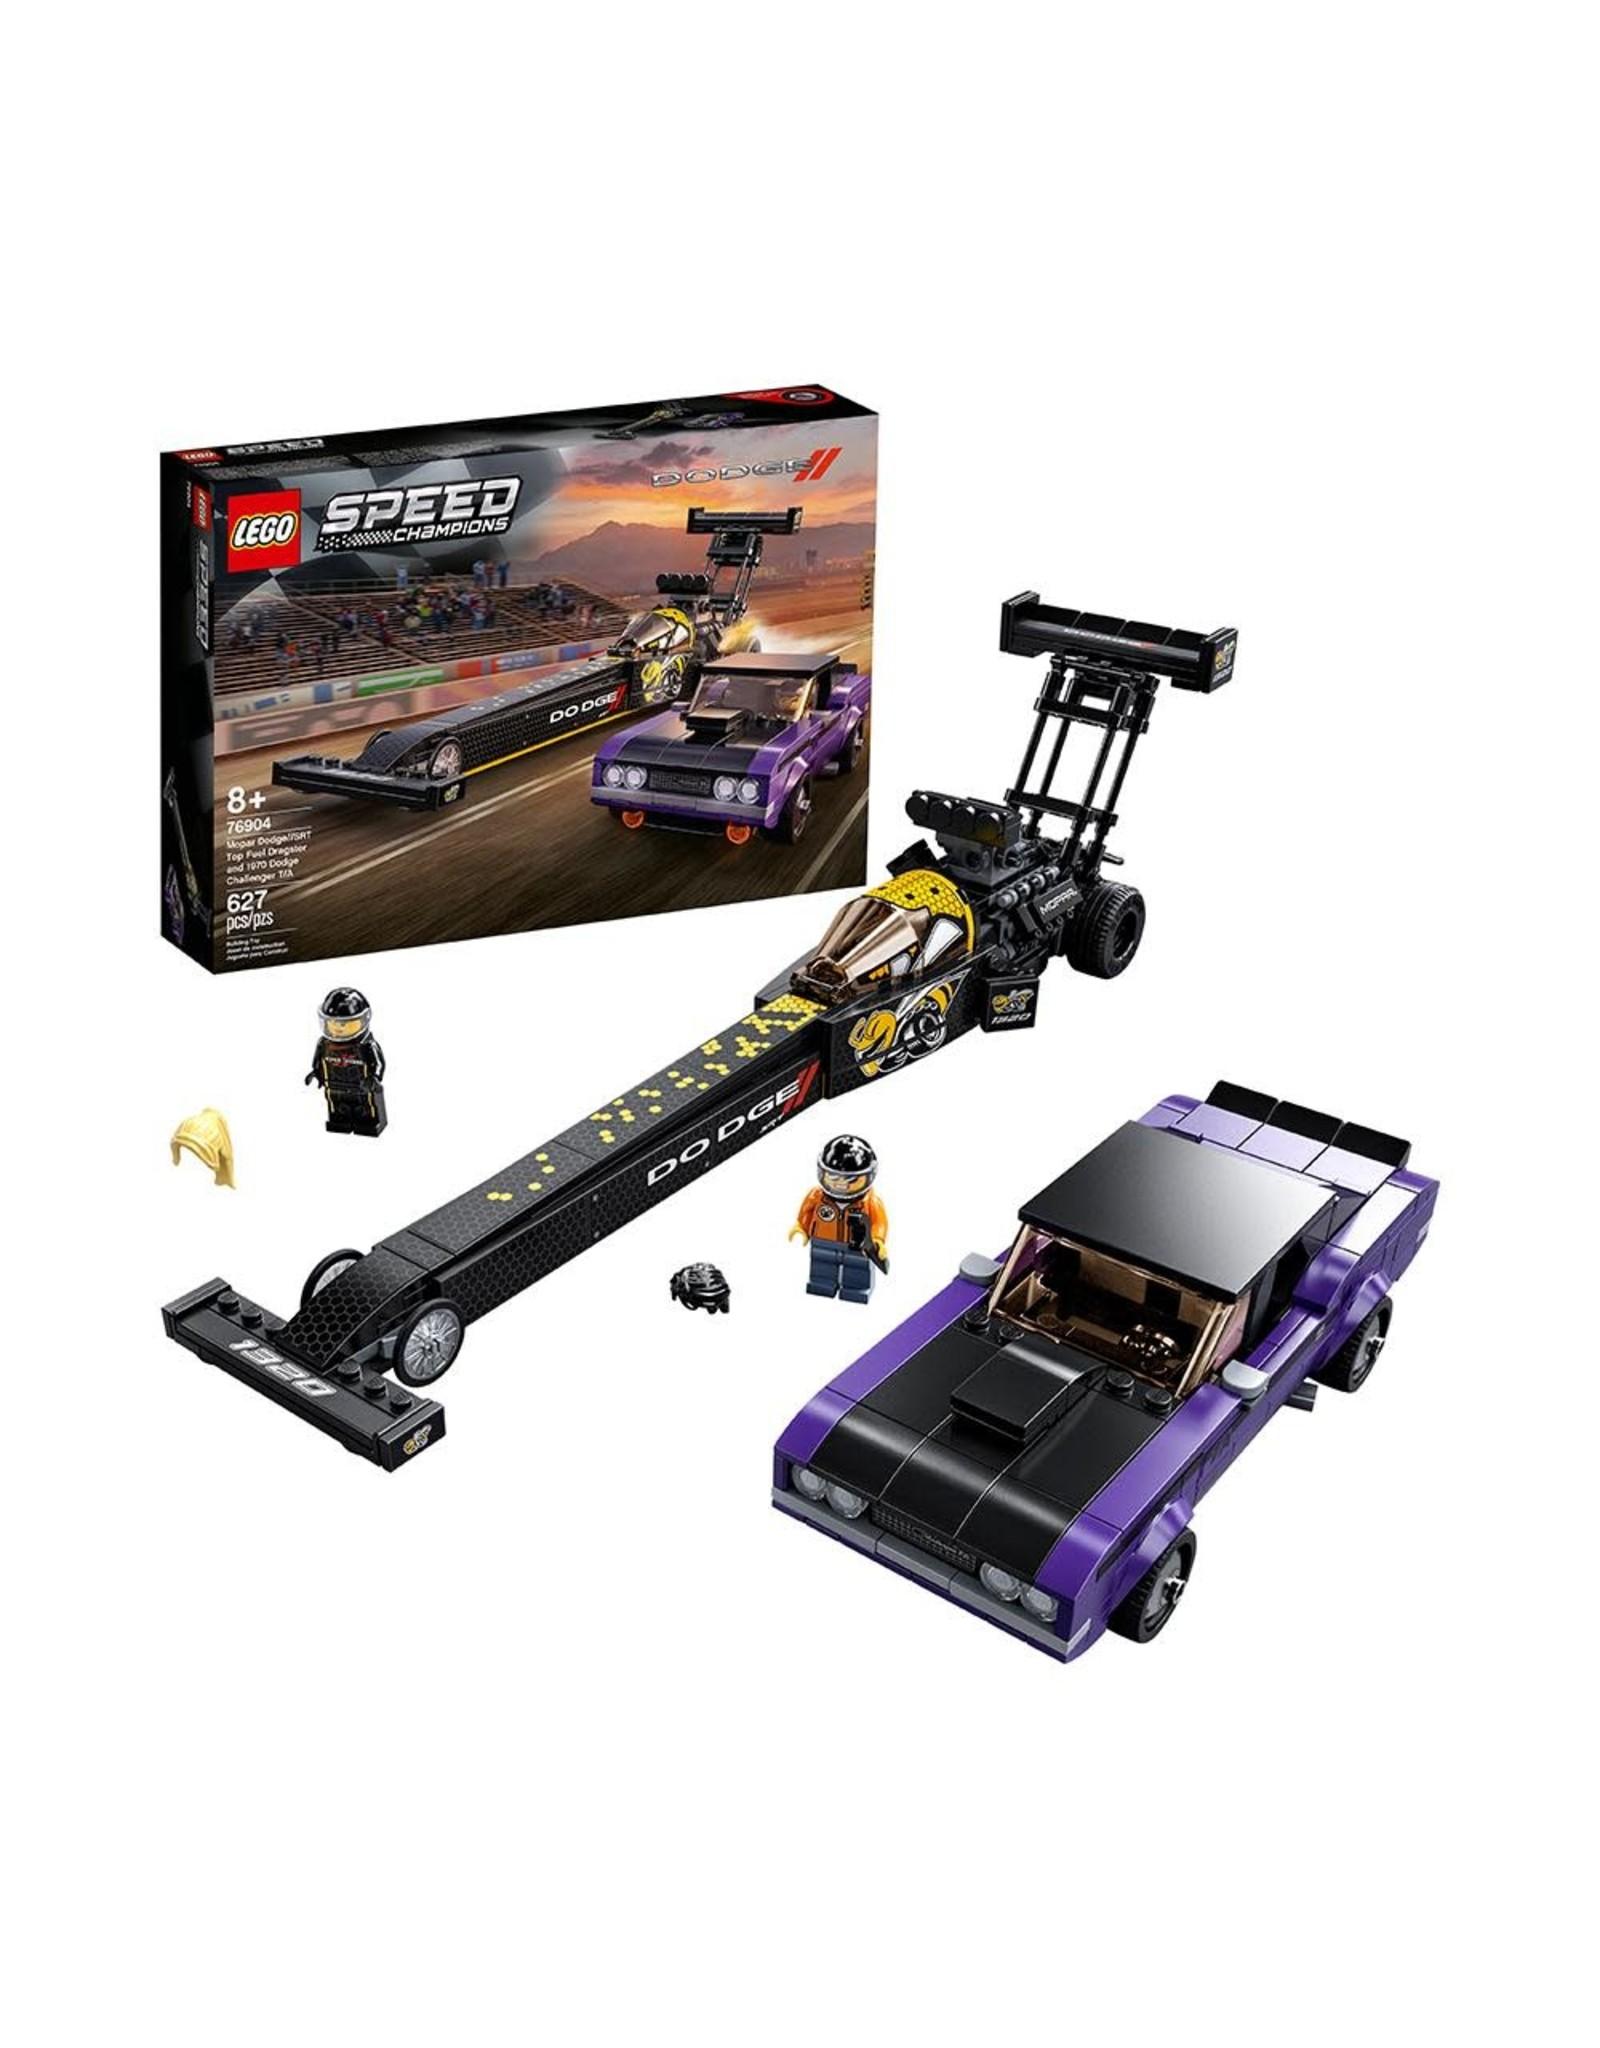 LEGO Speed Champions 76904 Mopar Dodge//SRT Top Fuel Dragster and Dodge Challenger T/A